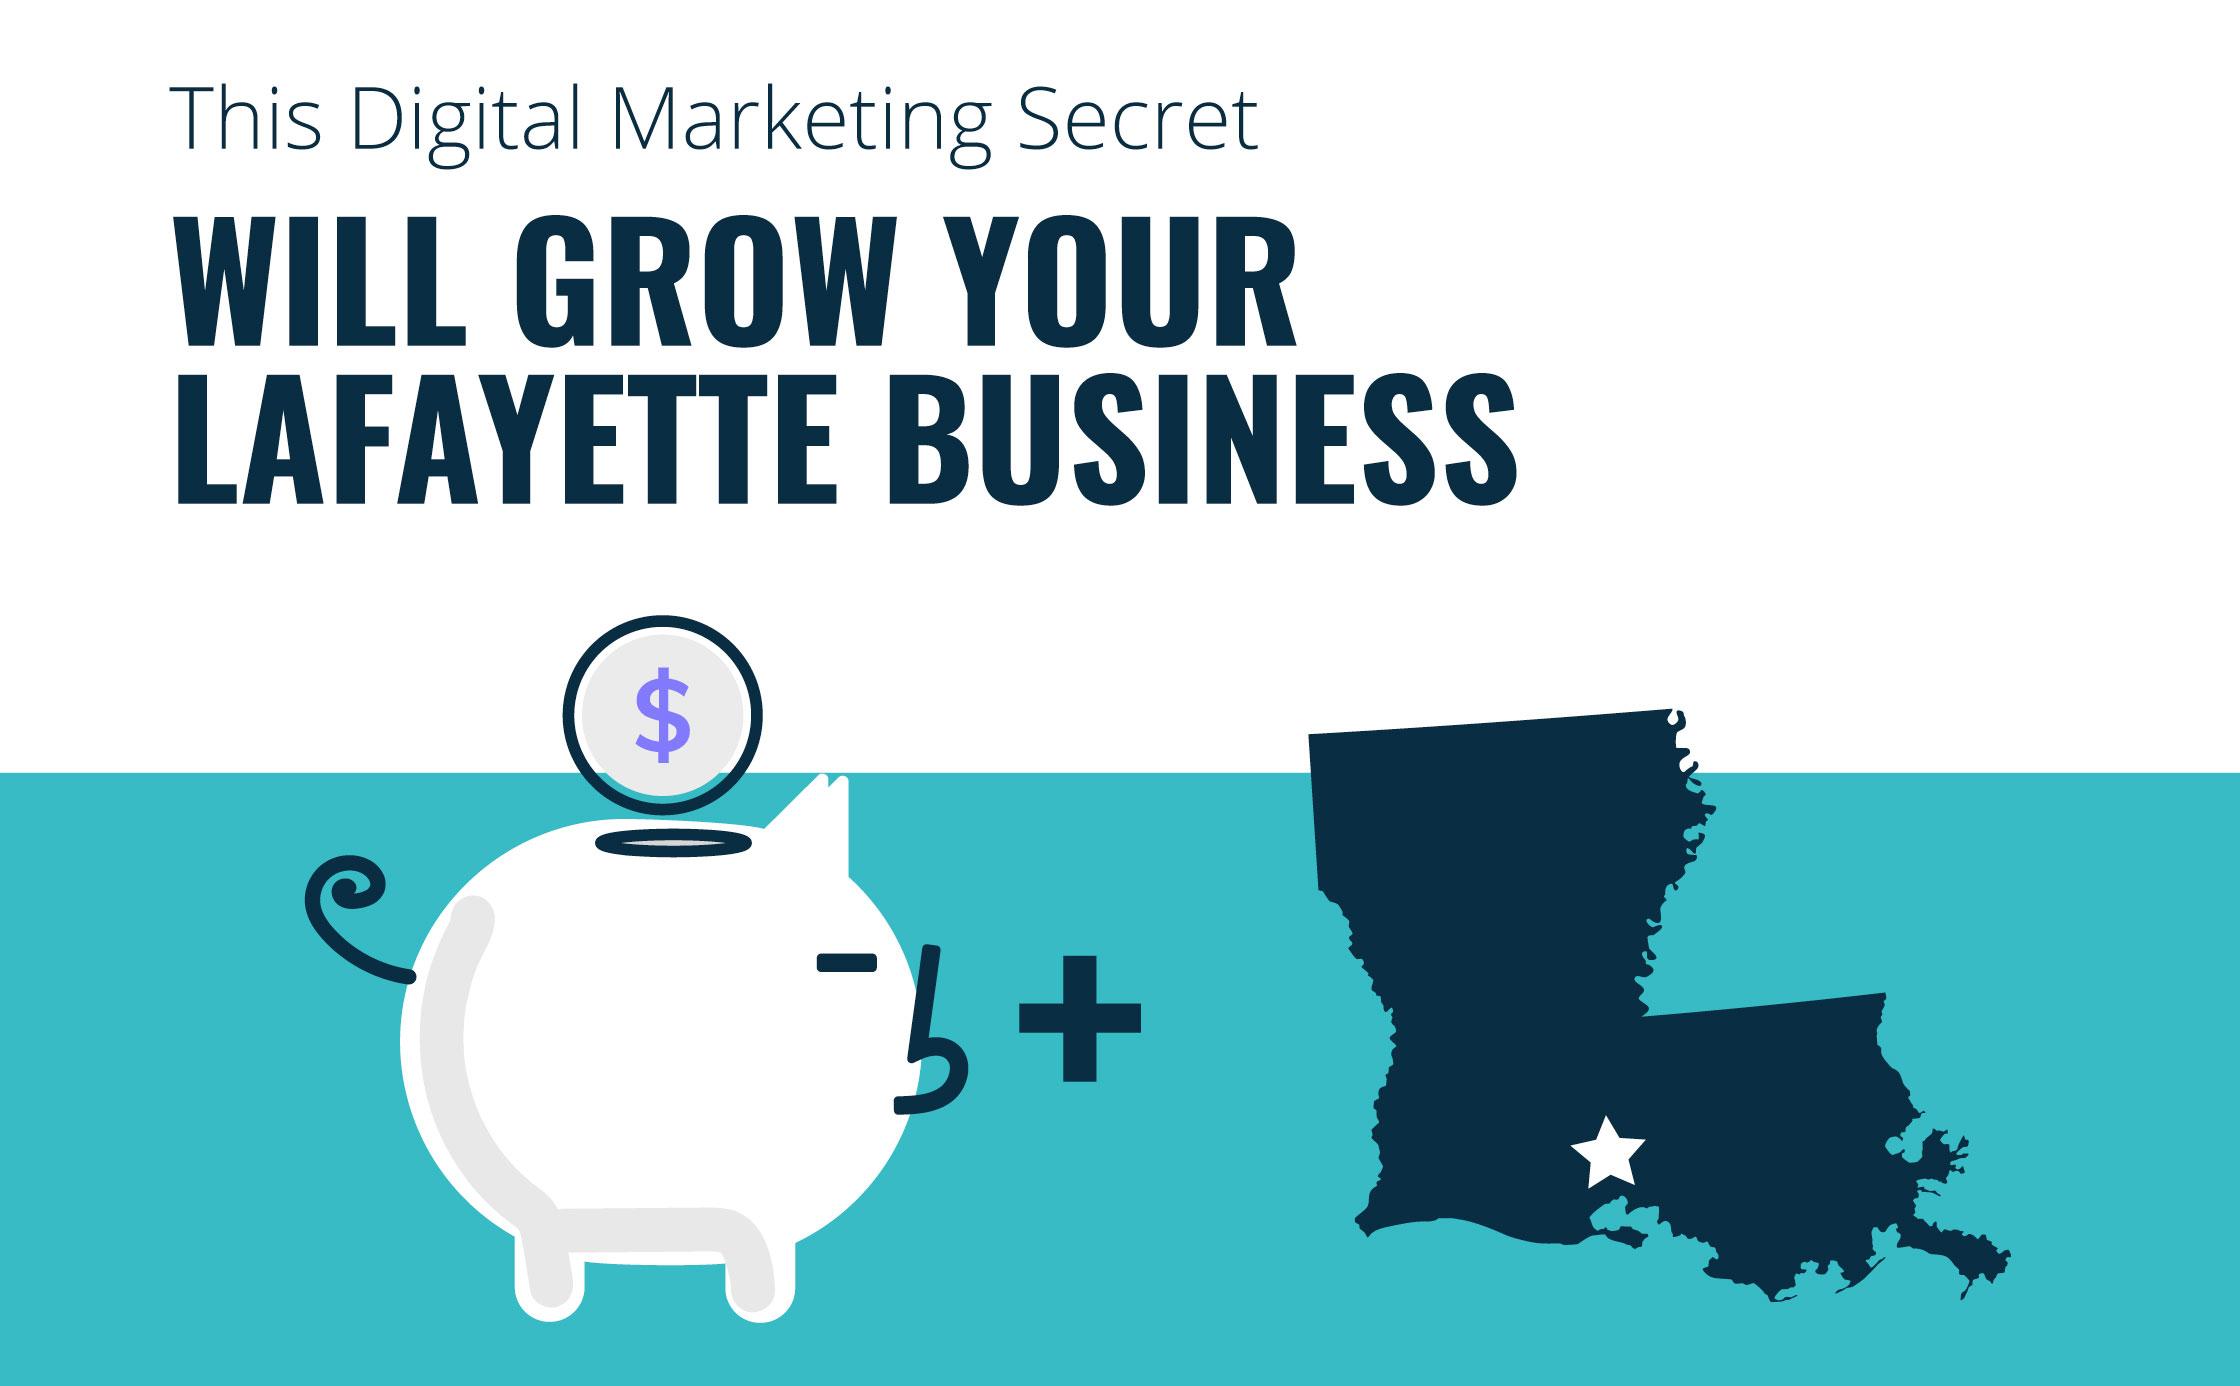 Digital Marketing Secret Will Grow Your Lafayette Business